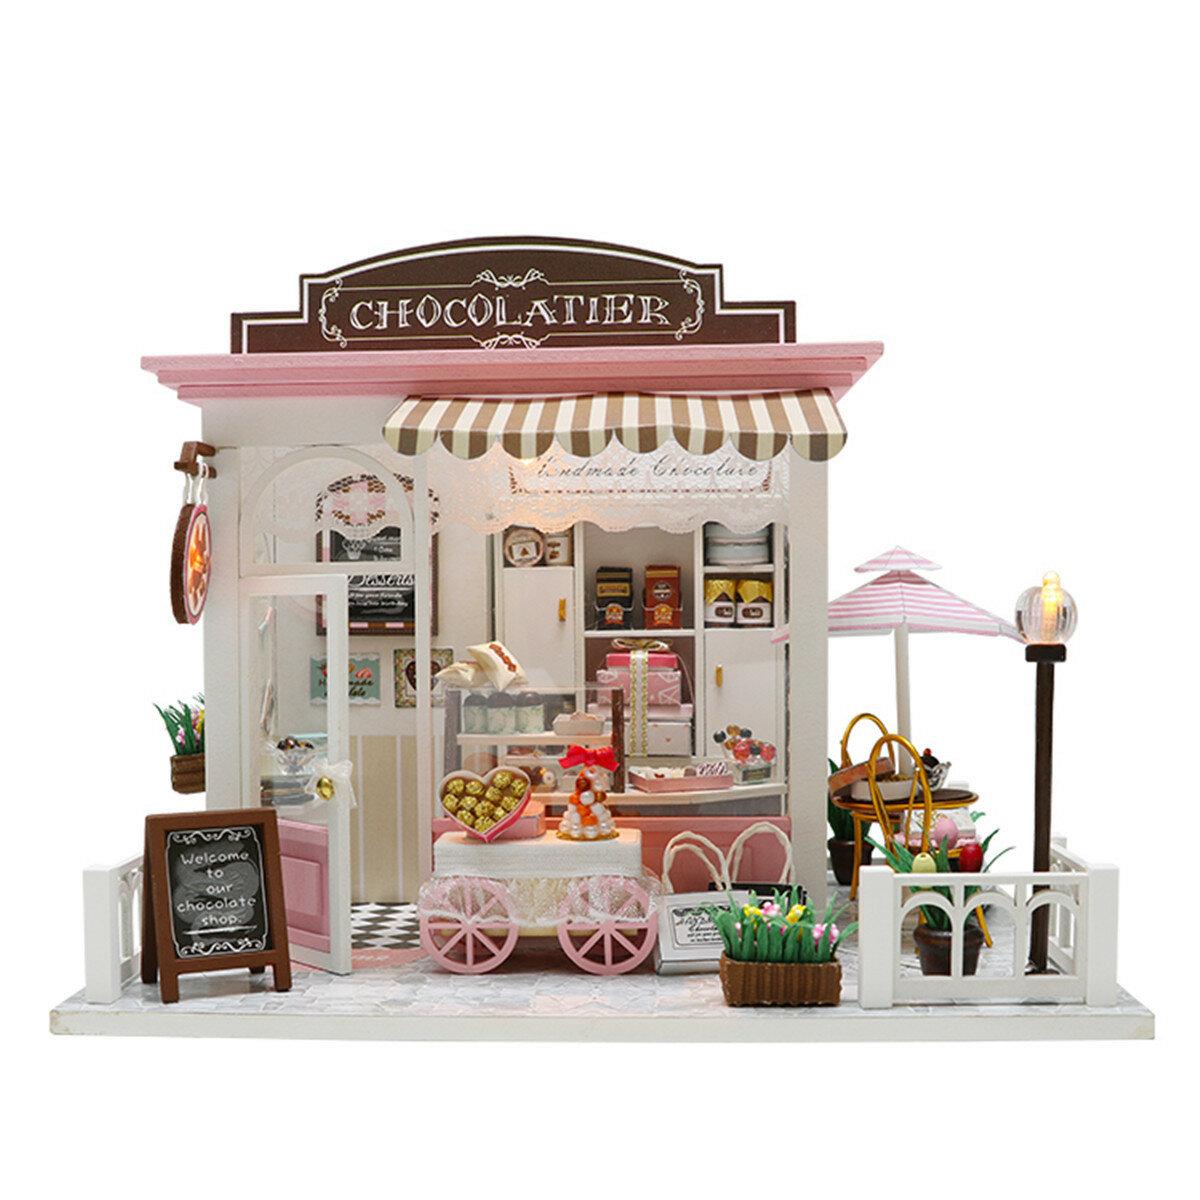 Doll House Kit Diy Miniature Wooden Handmade House Cake Shop Kids